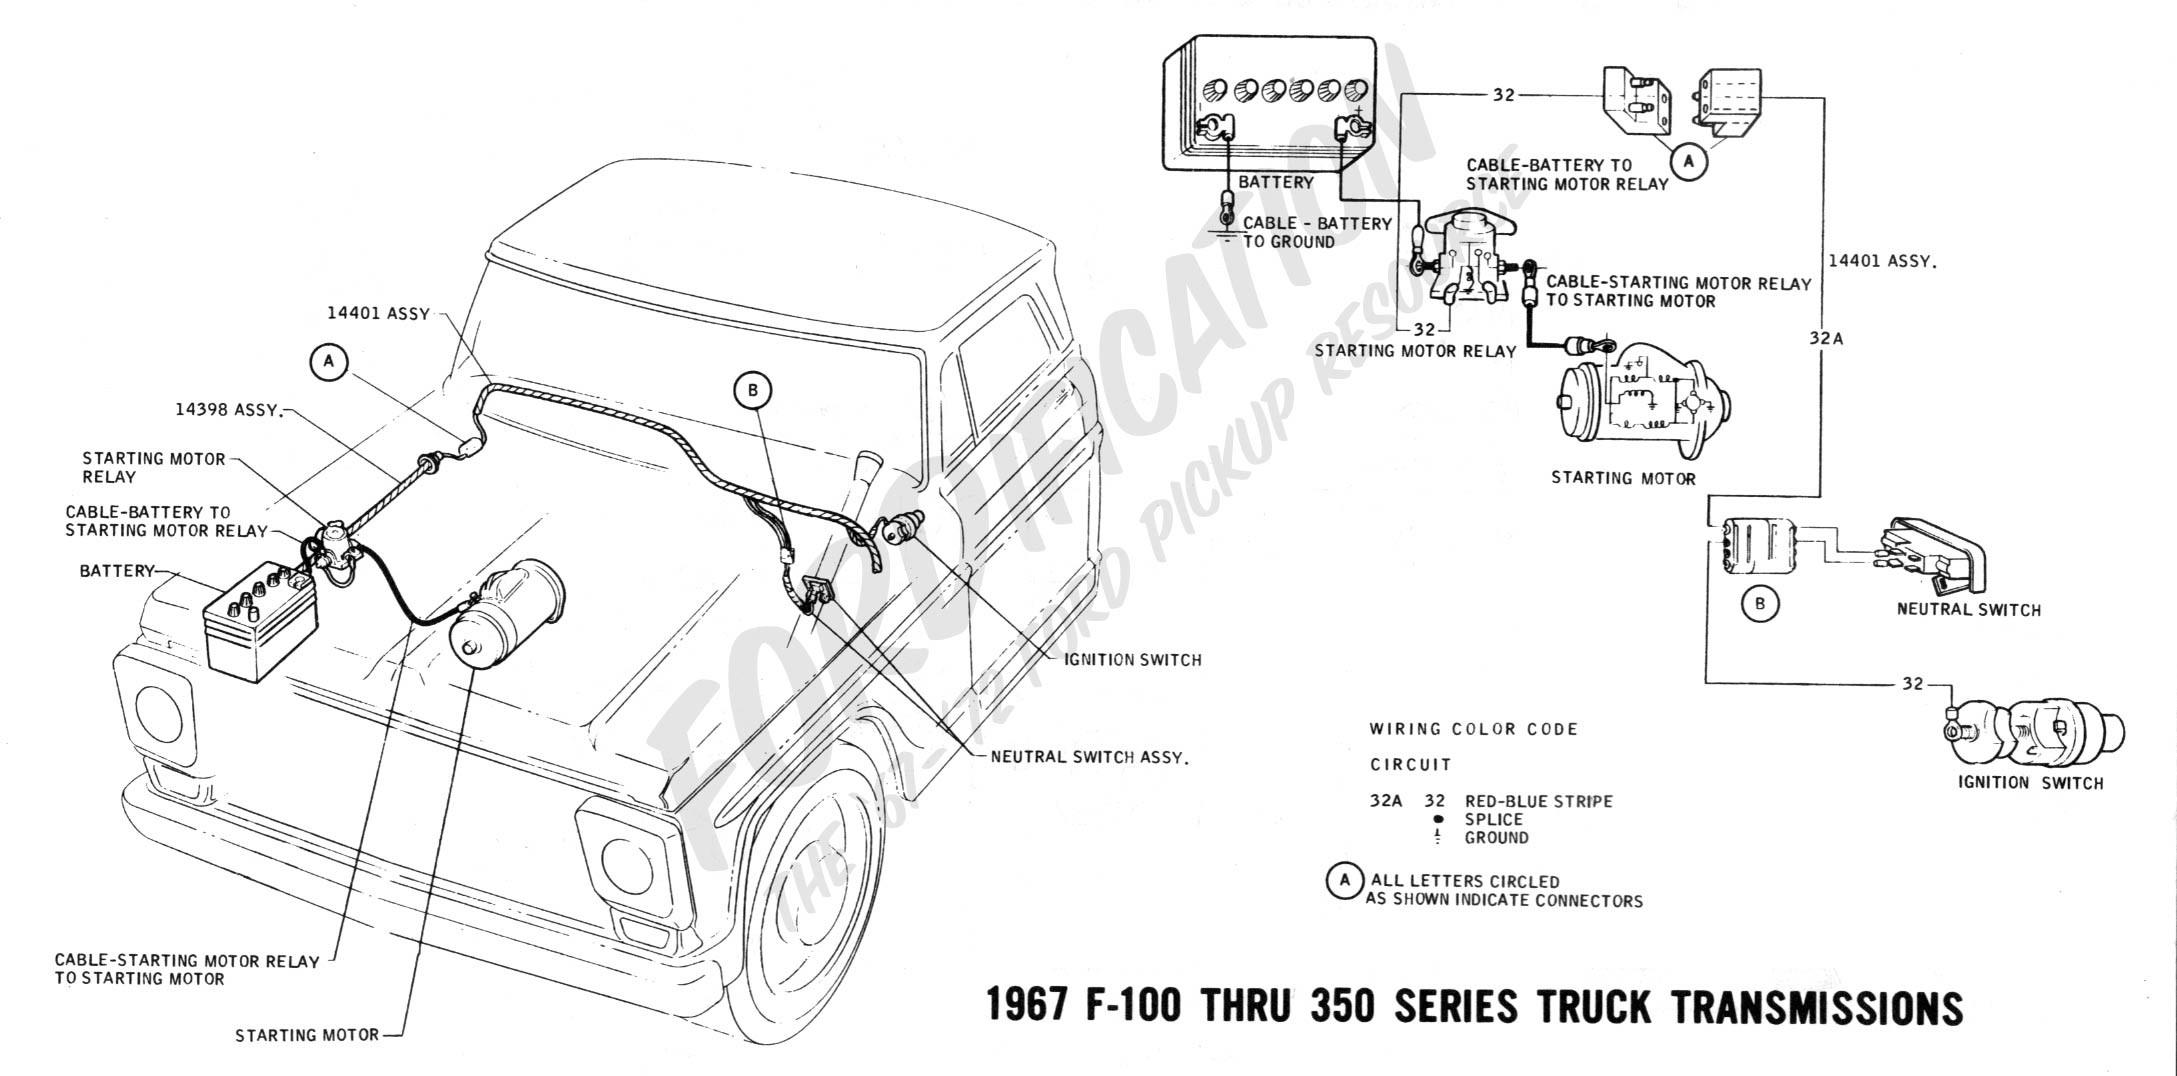 1990 ford f150 starter solenoid wiring diagram inspirational rh mainetreasurechest com 2008 F150 Wiring Diagram 2005 F150 Wiring Diagram